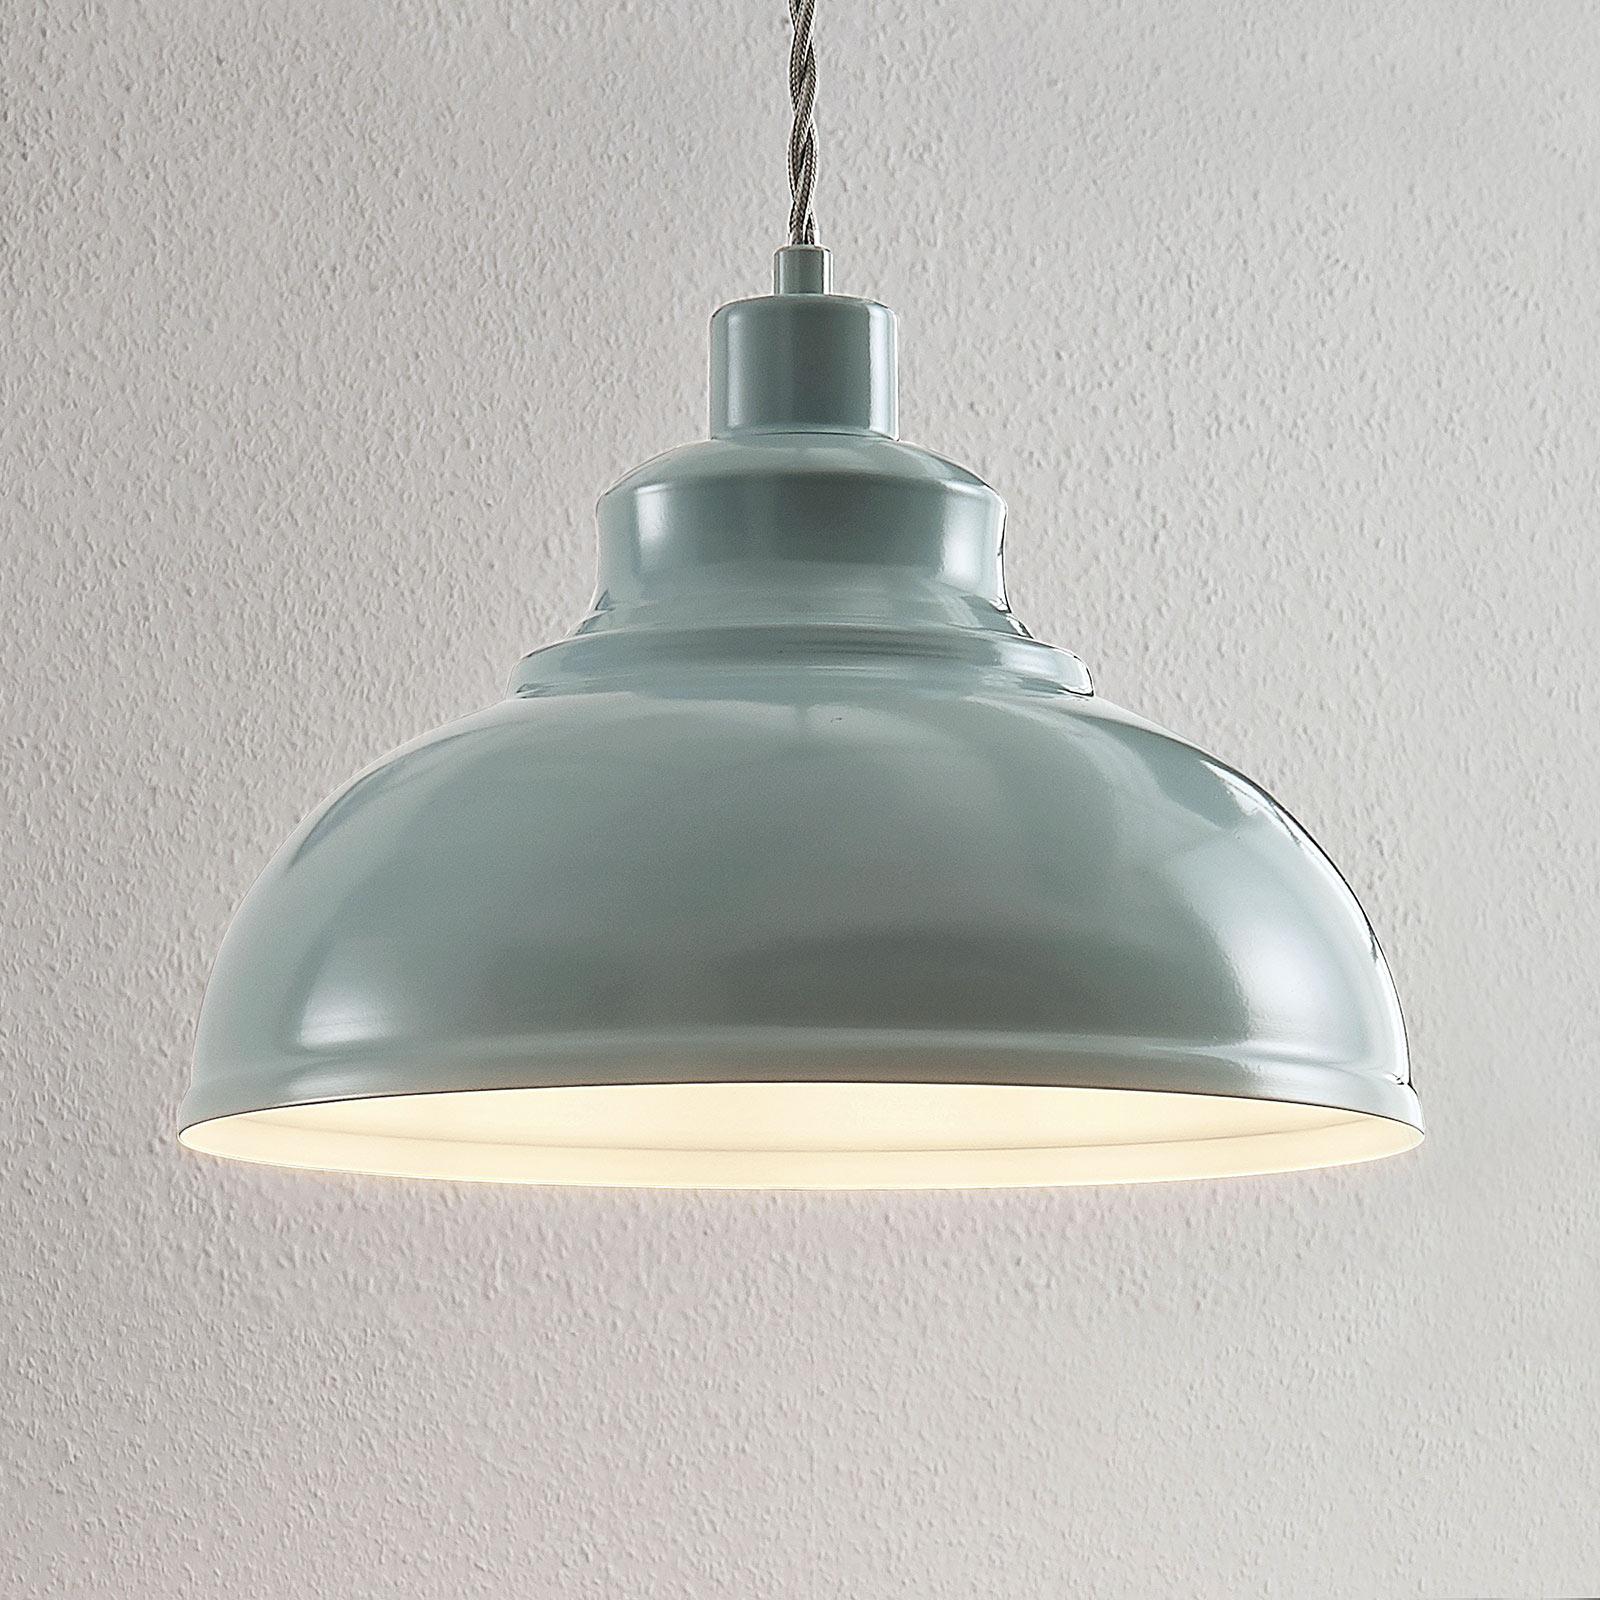 Lámpara colgante Albertine, metal, azul celeste